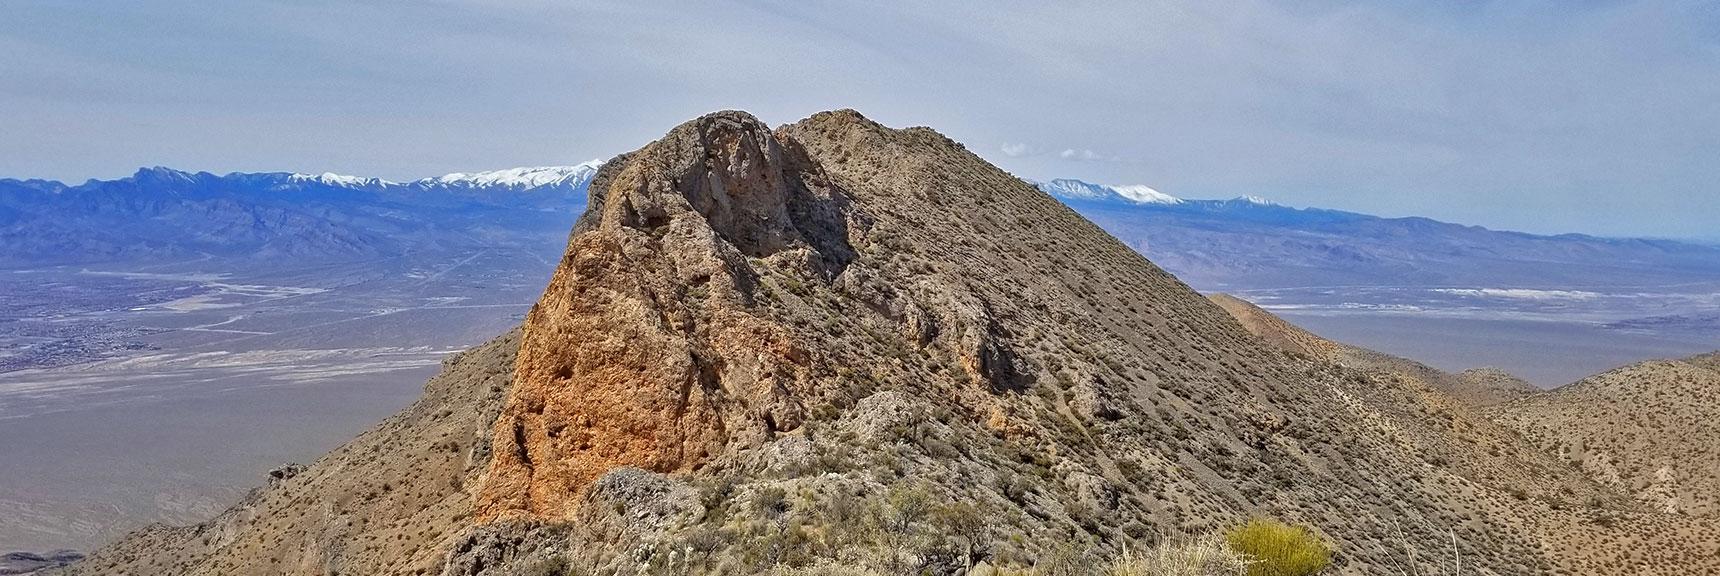 View of the Mid-Summit Bluff Avalanche Slope on the Gass Peak Gauntlet Route | Gass Peak Eastern Summit Ultra-marathon Adventure, Nevada